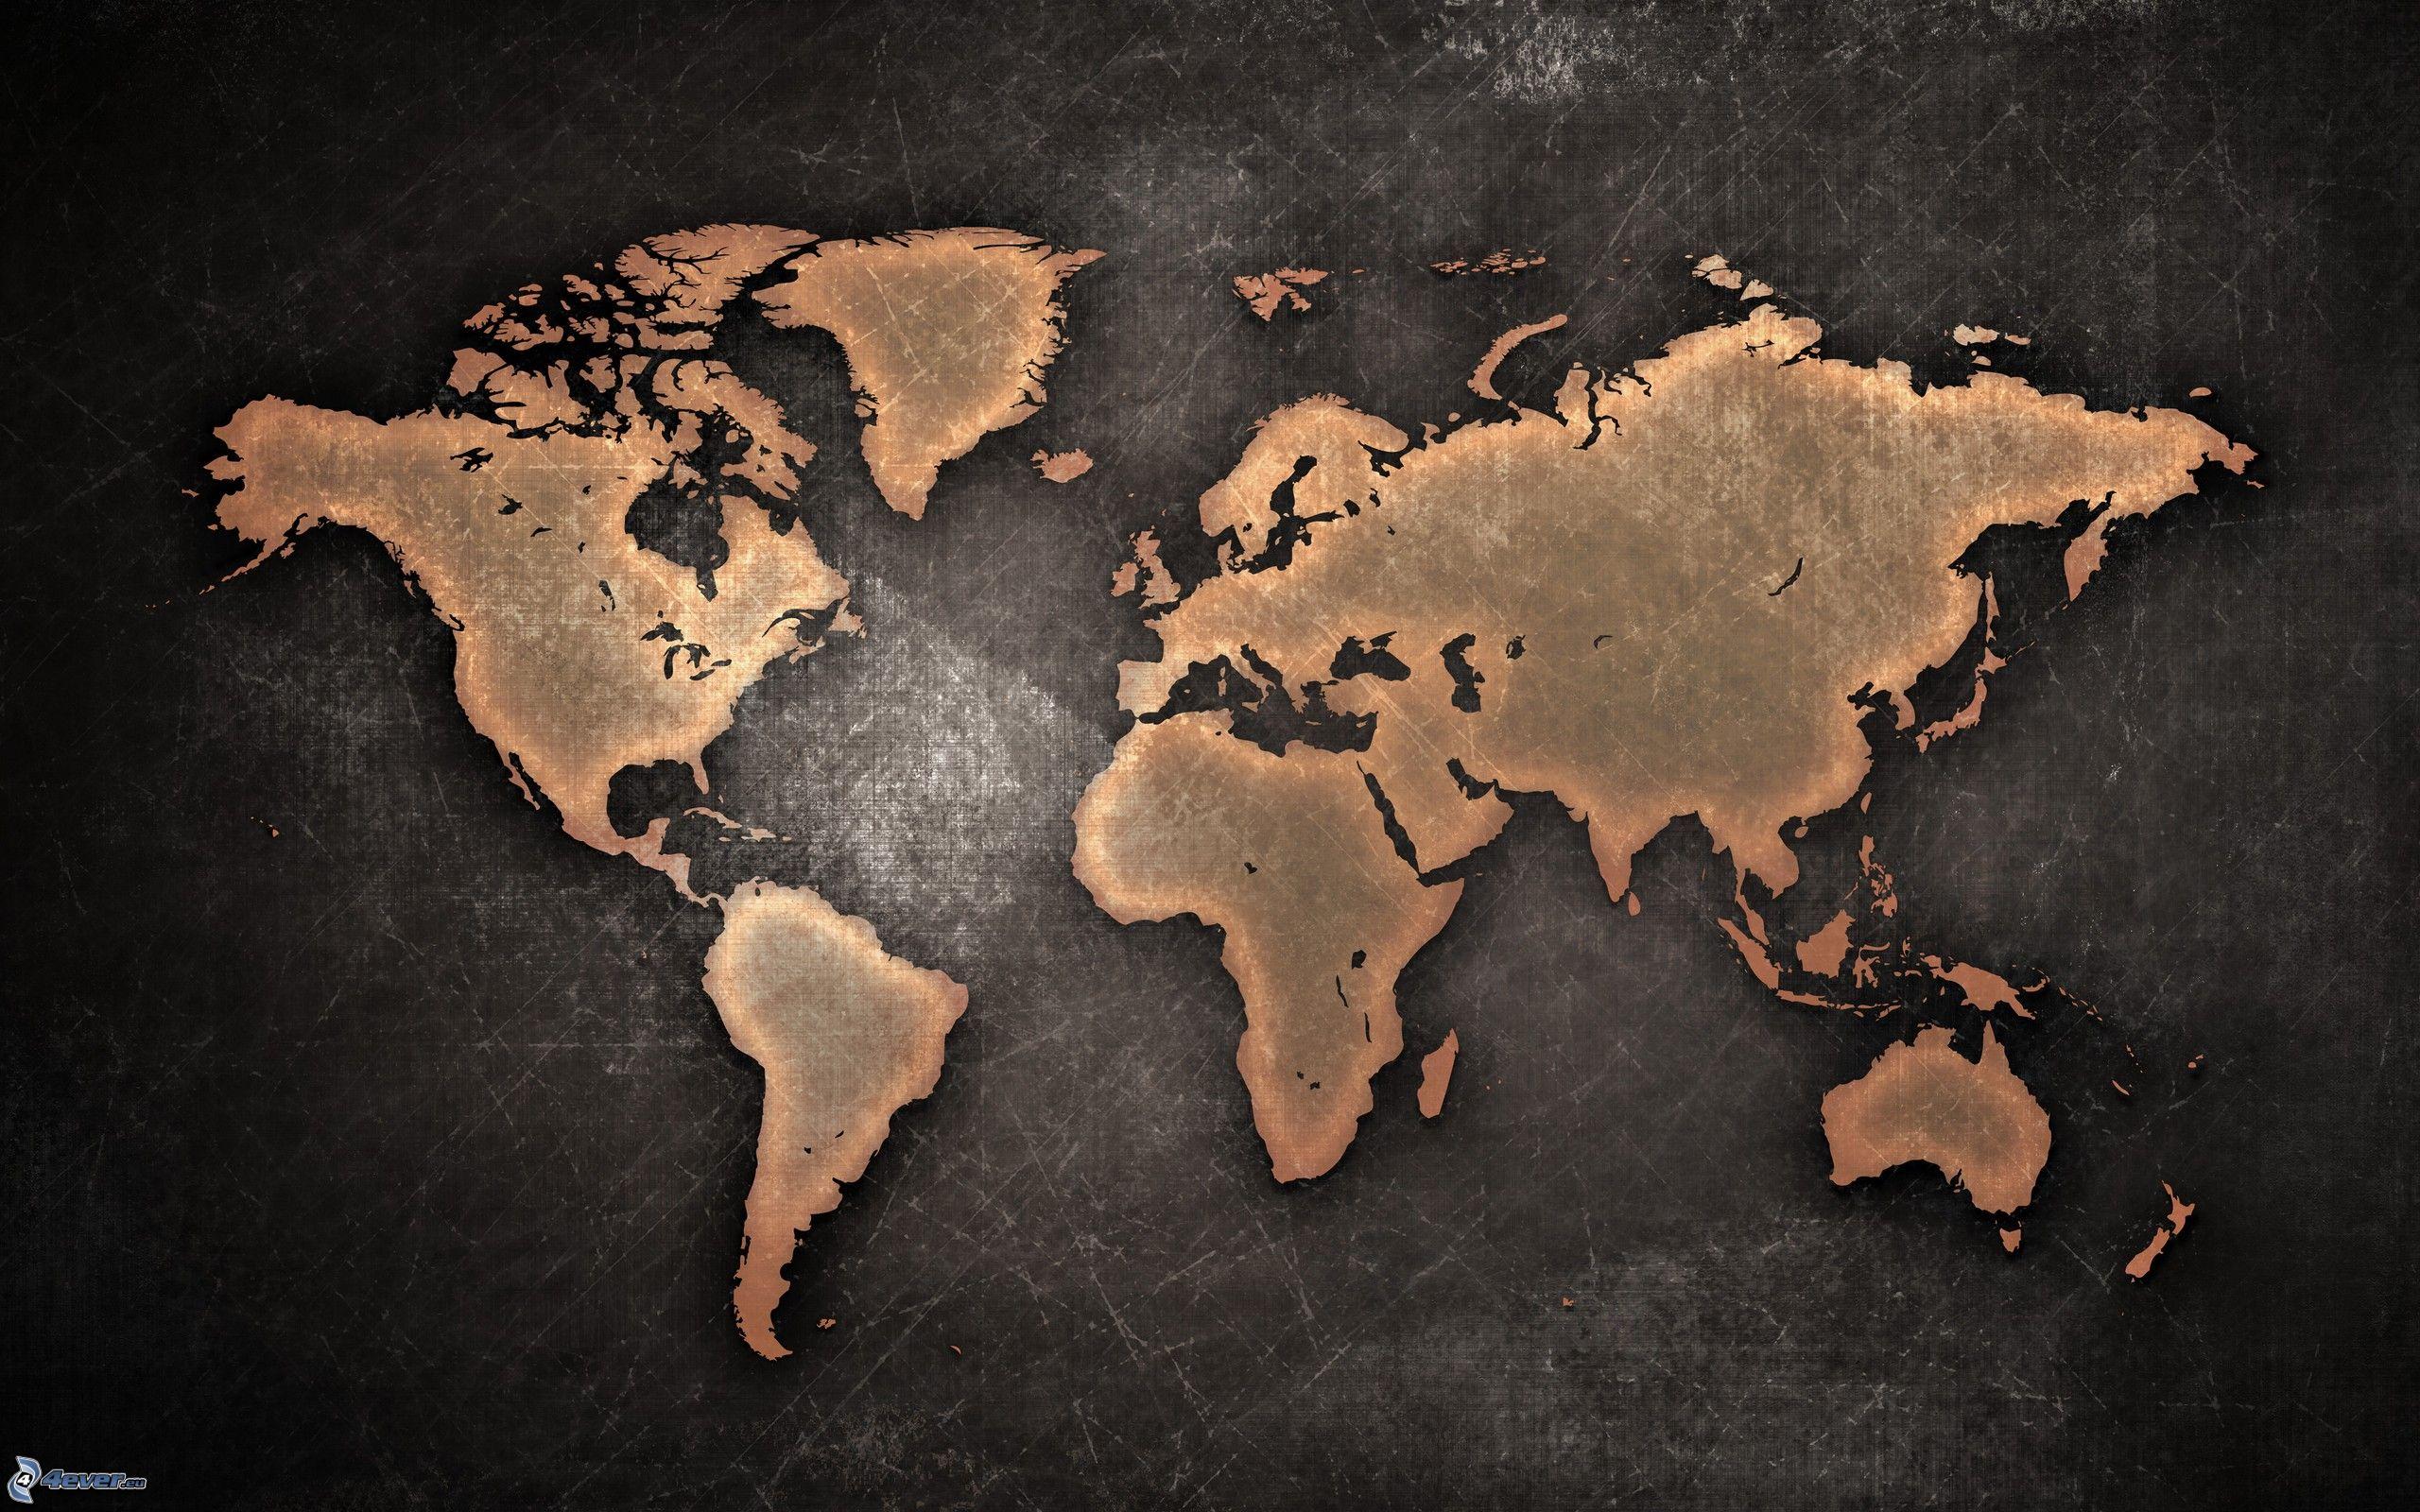 Dessin D Une Carte Du Monde | casamagenta